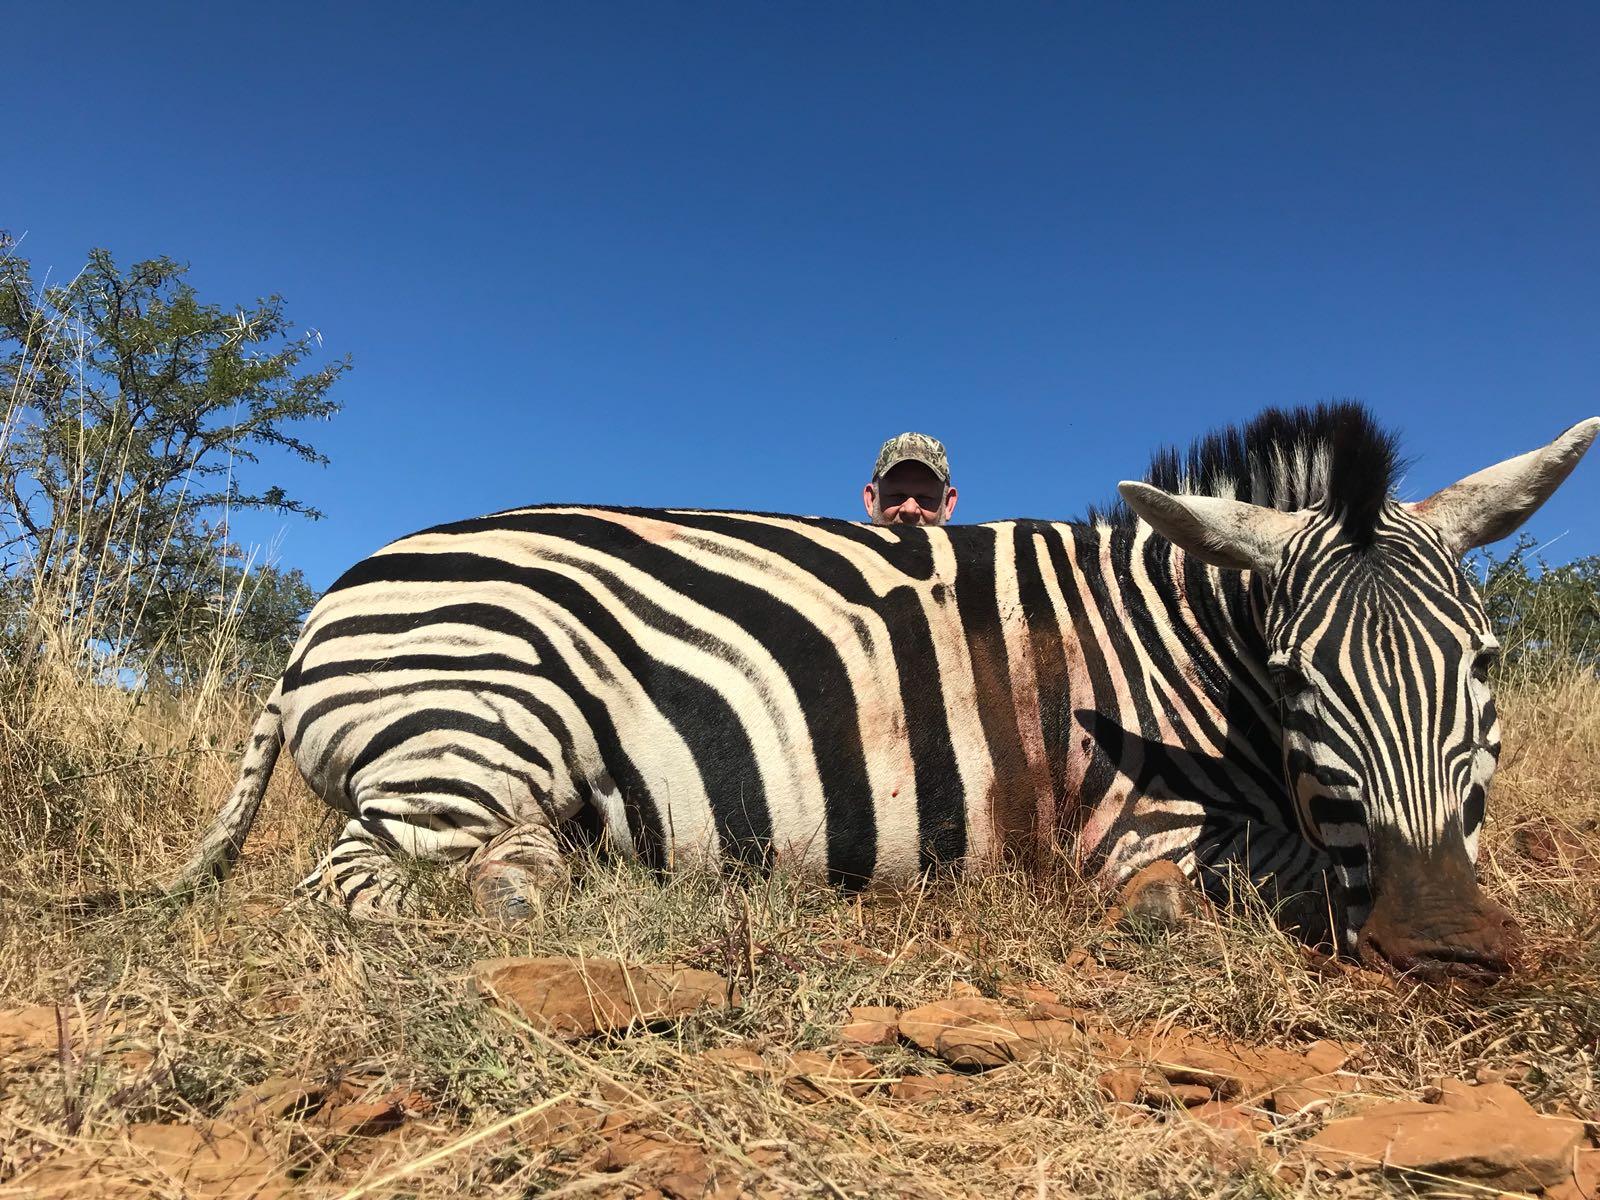 Alan Fitzsimmons Zebra 2018